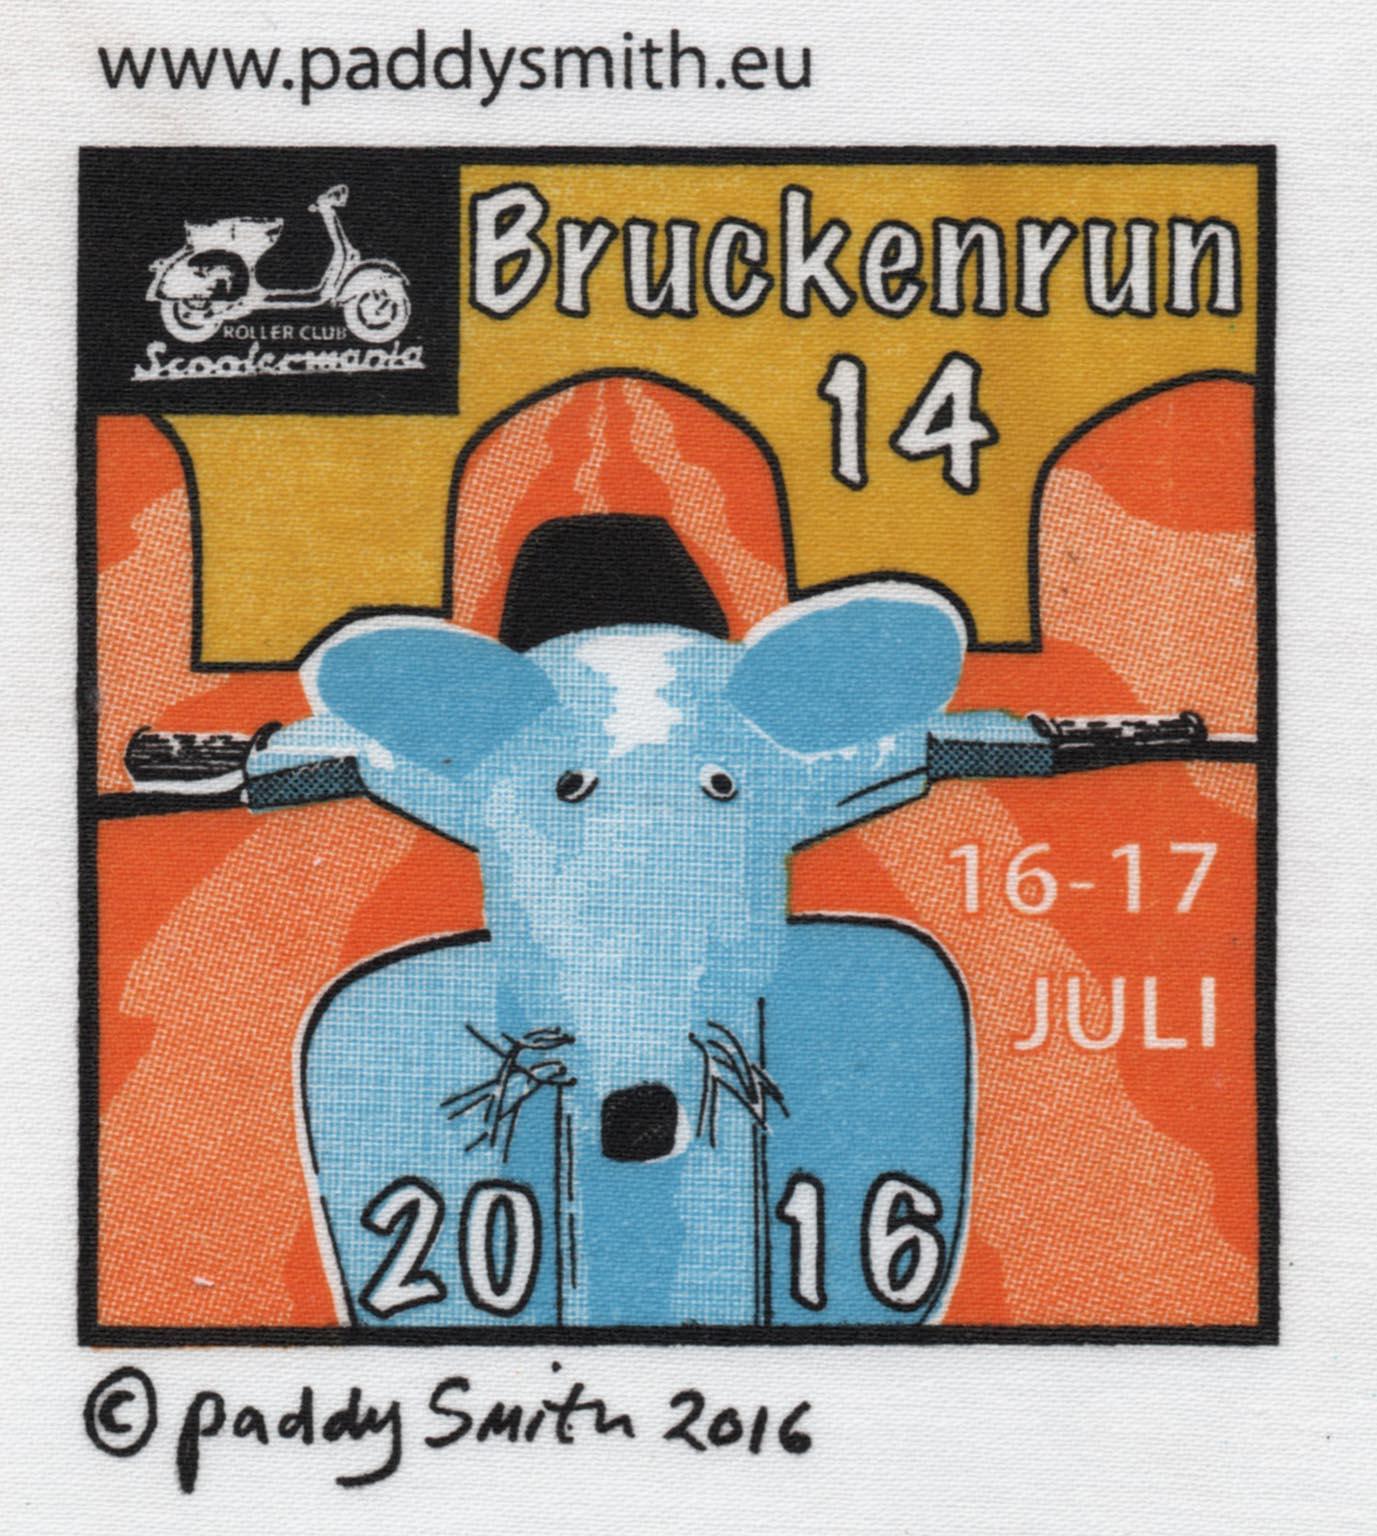 Bruckenrun patch